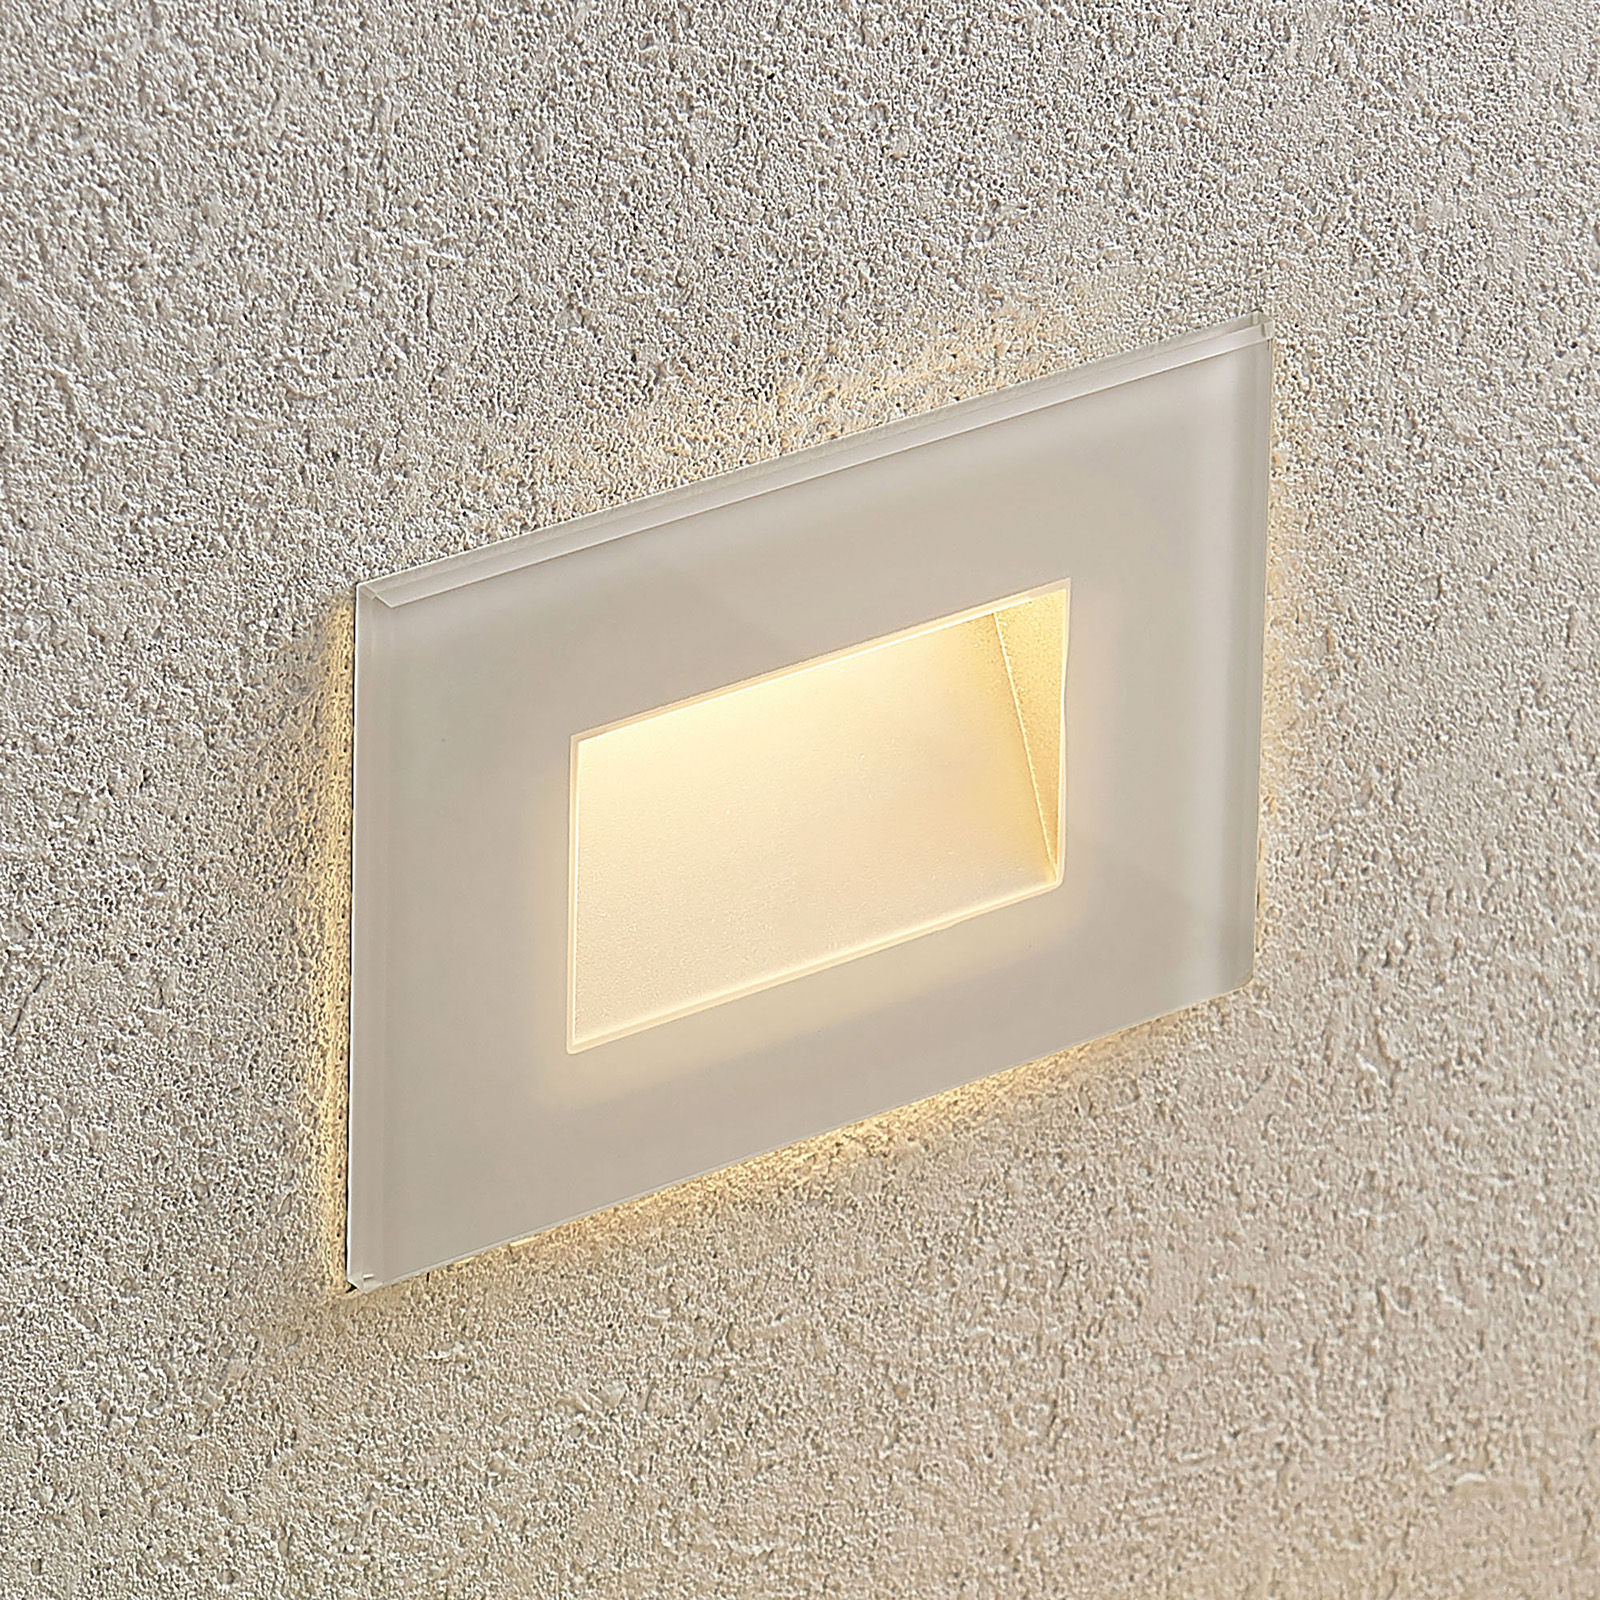 Lampa ścienna LED Jody, 12 cm, poliwęglan